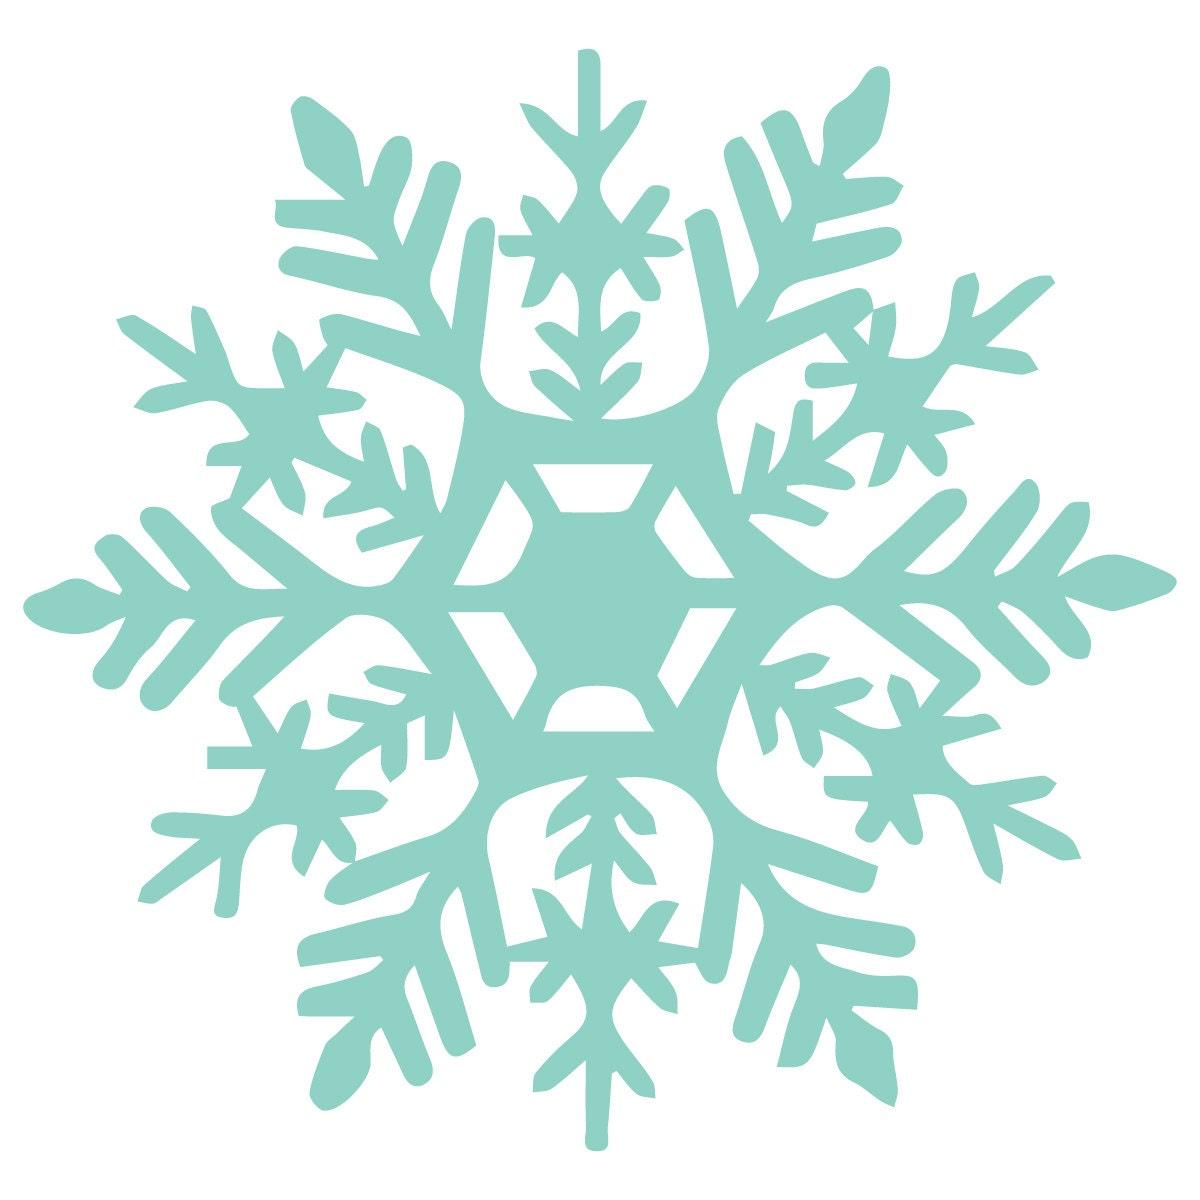 Snowflake Vinyl Decal Design 1 Frozen Party by NipomoImprints